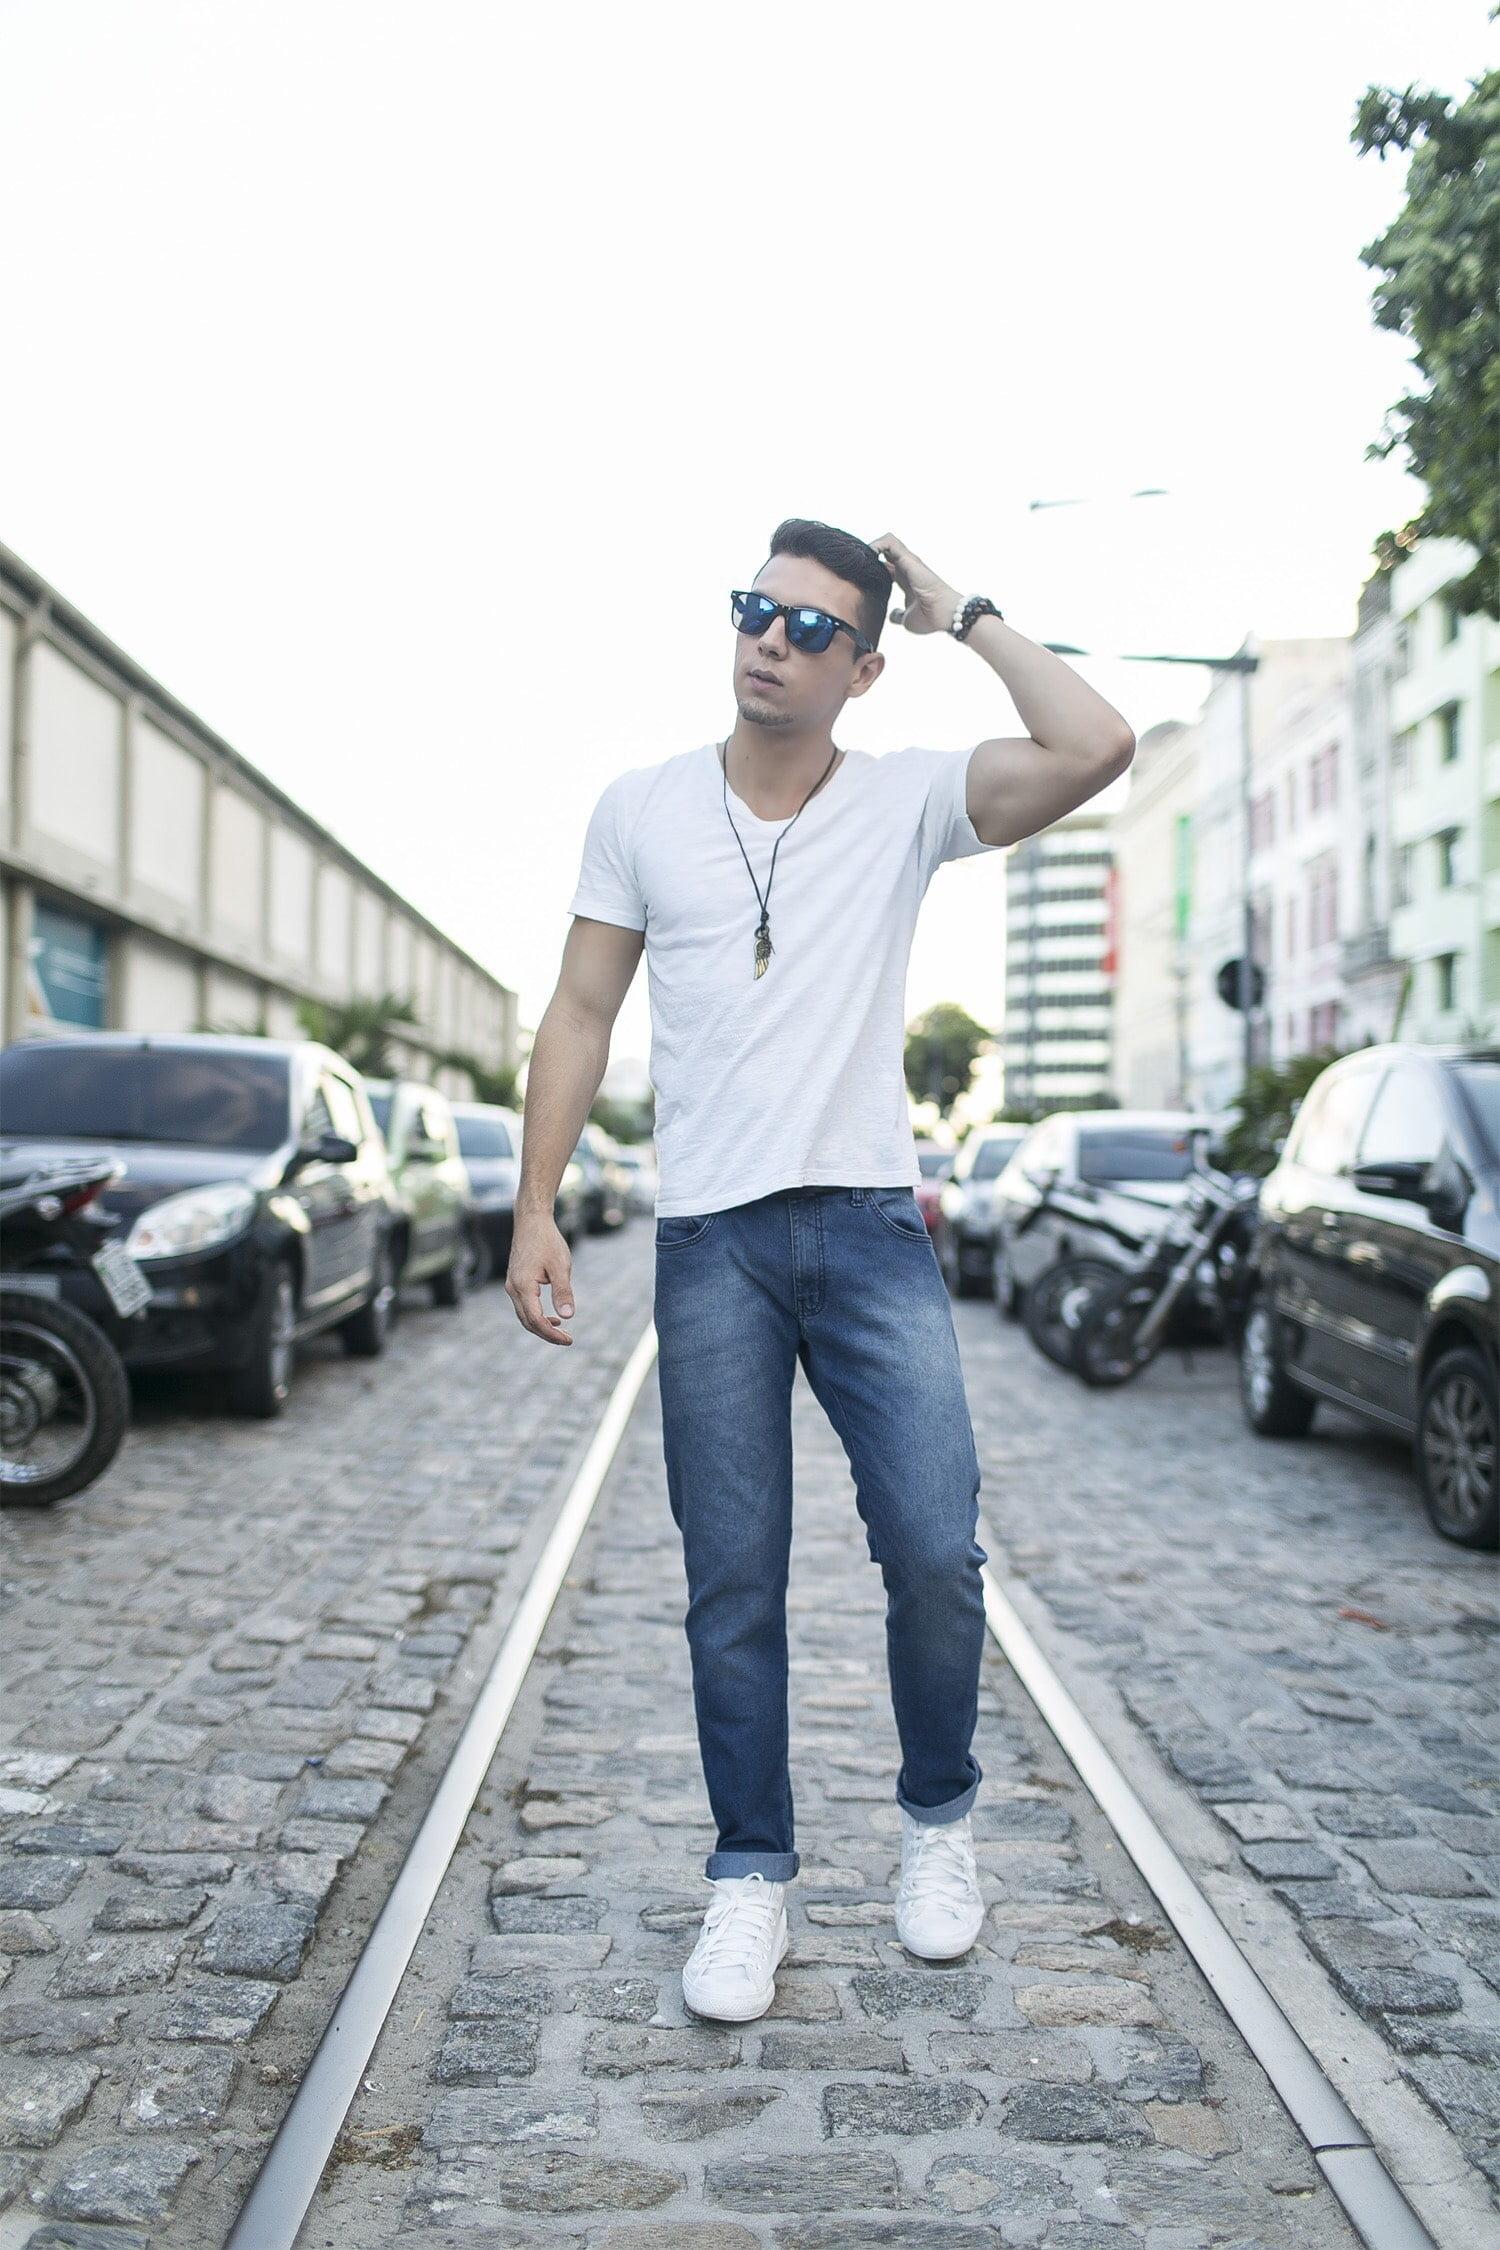 Estilo HQSC Básico com Sneakers Juan Alves 2